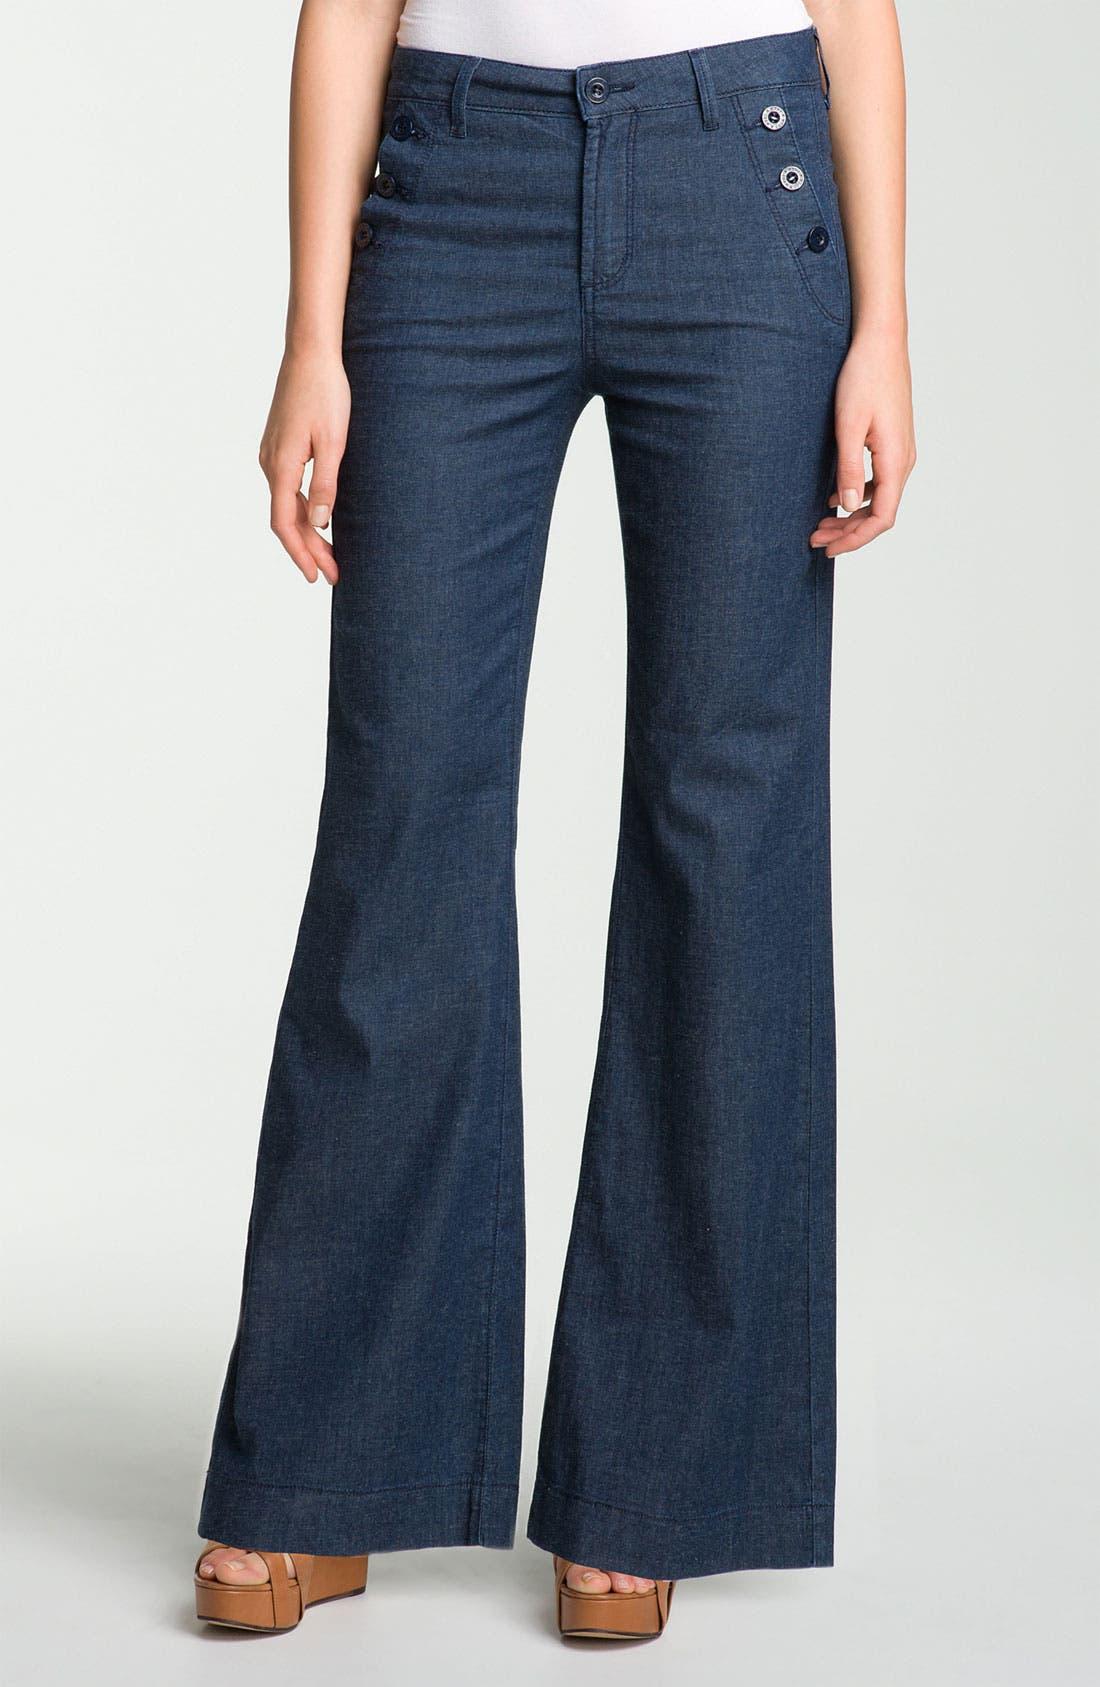 Main Image - NYDJ 'Tina Sailor' Wide Leg Jeans (Petite)